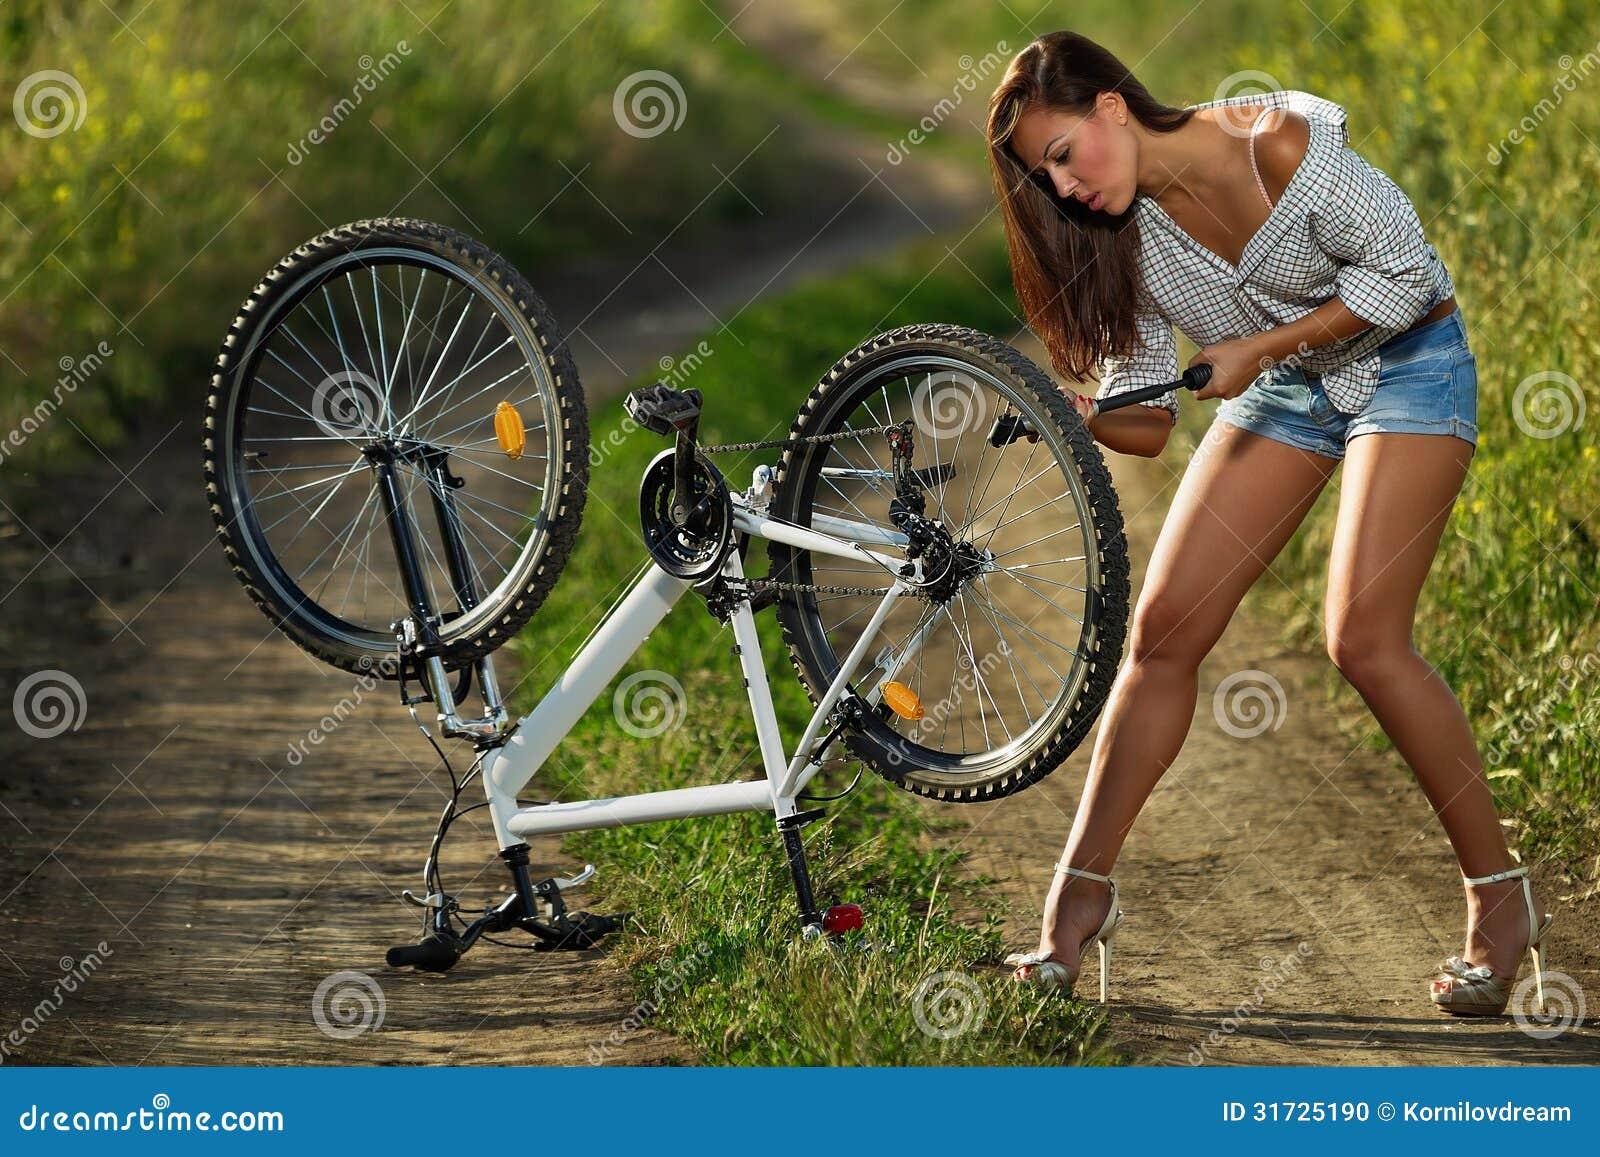 Naked Girl On Bike Porn Videos Pornhubcom